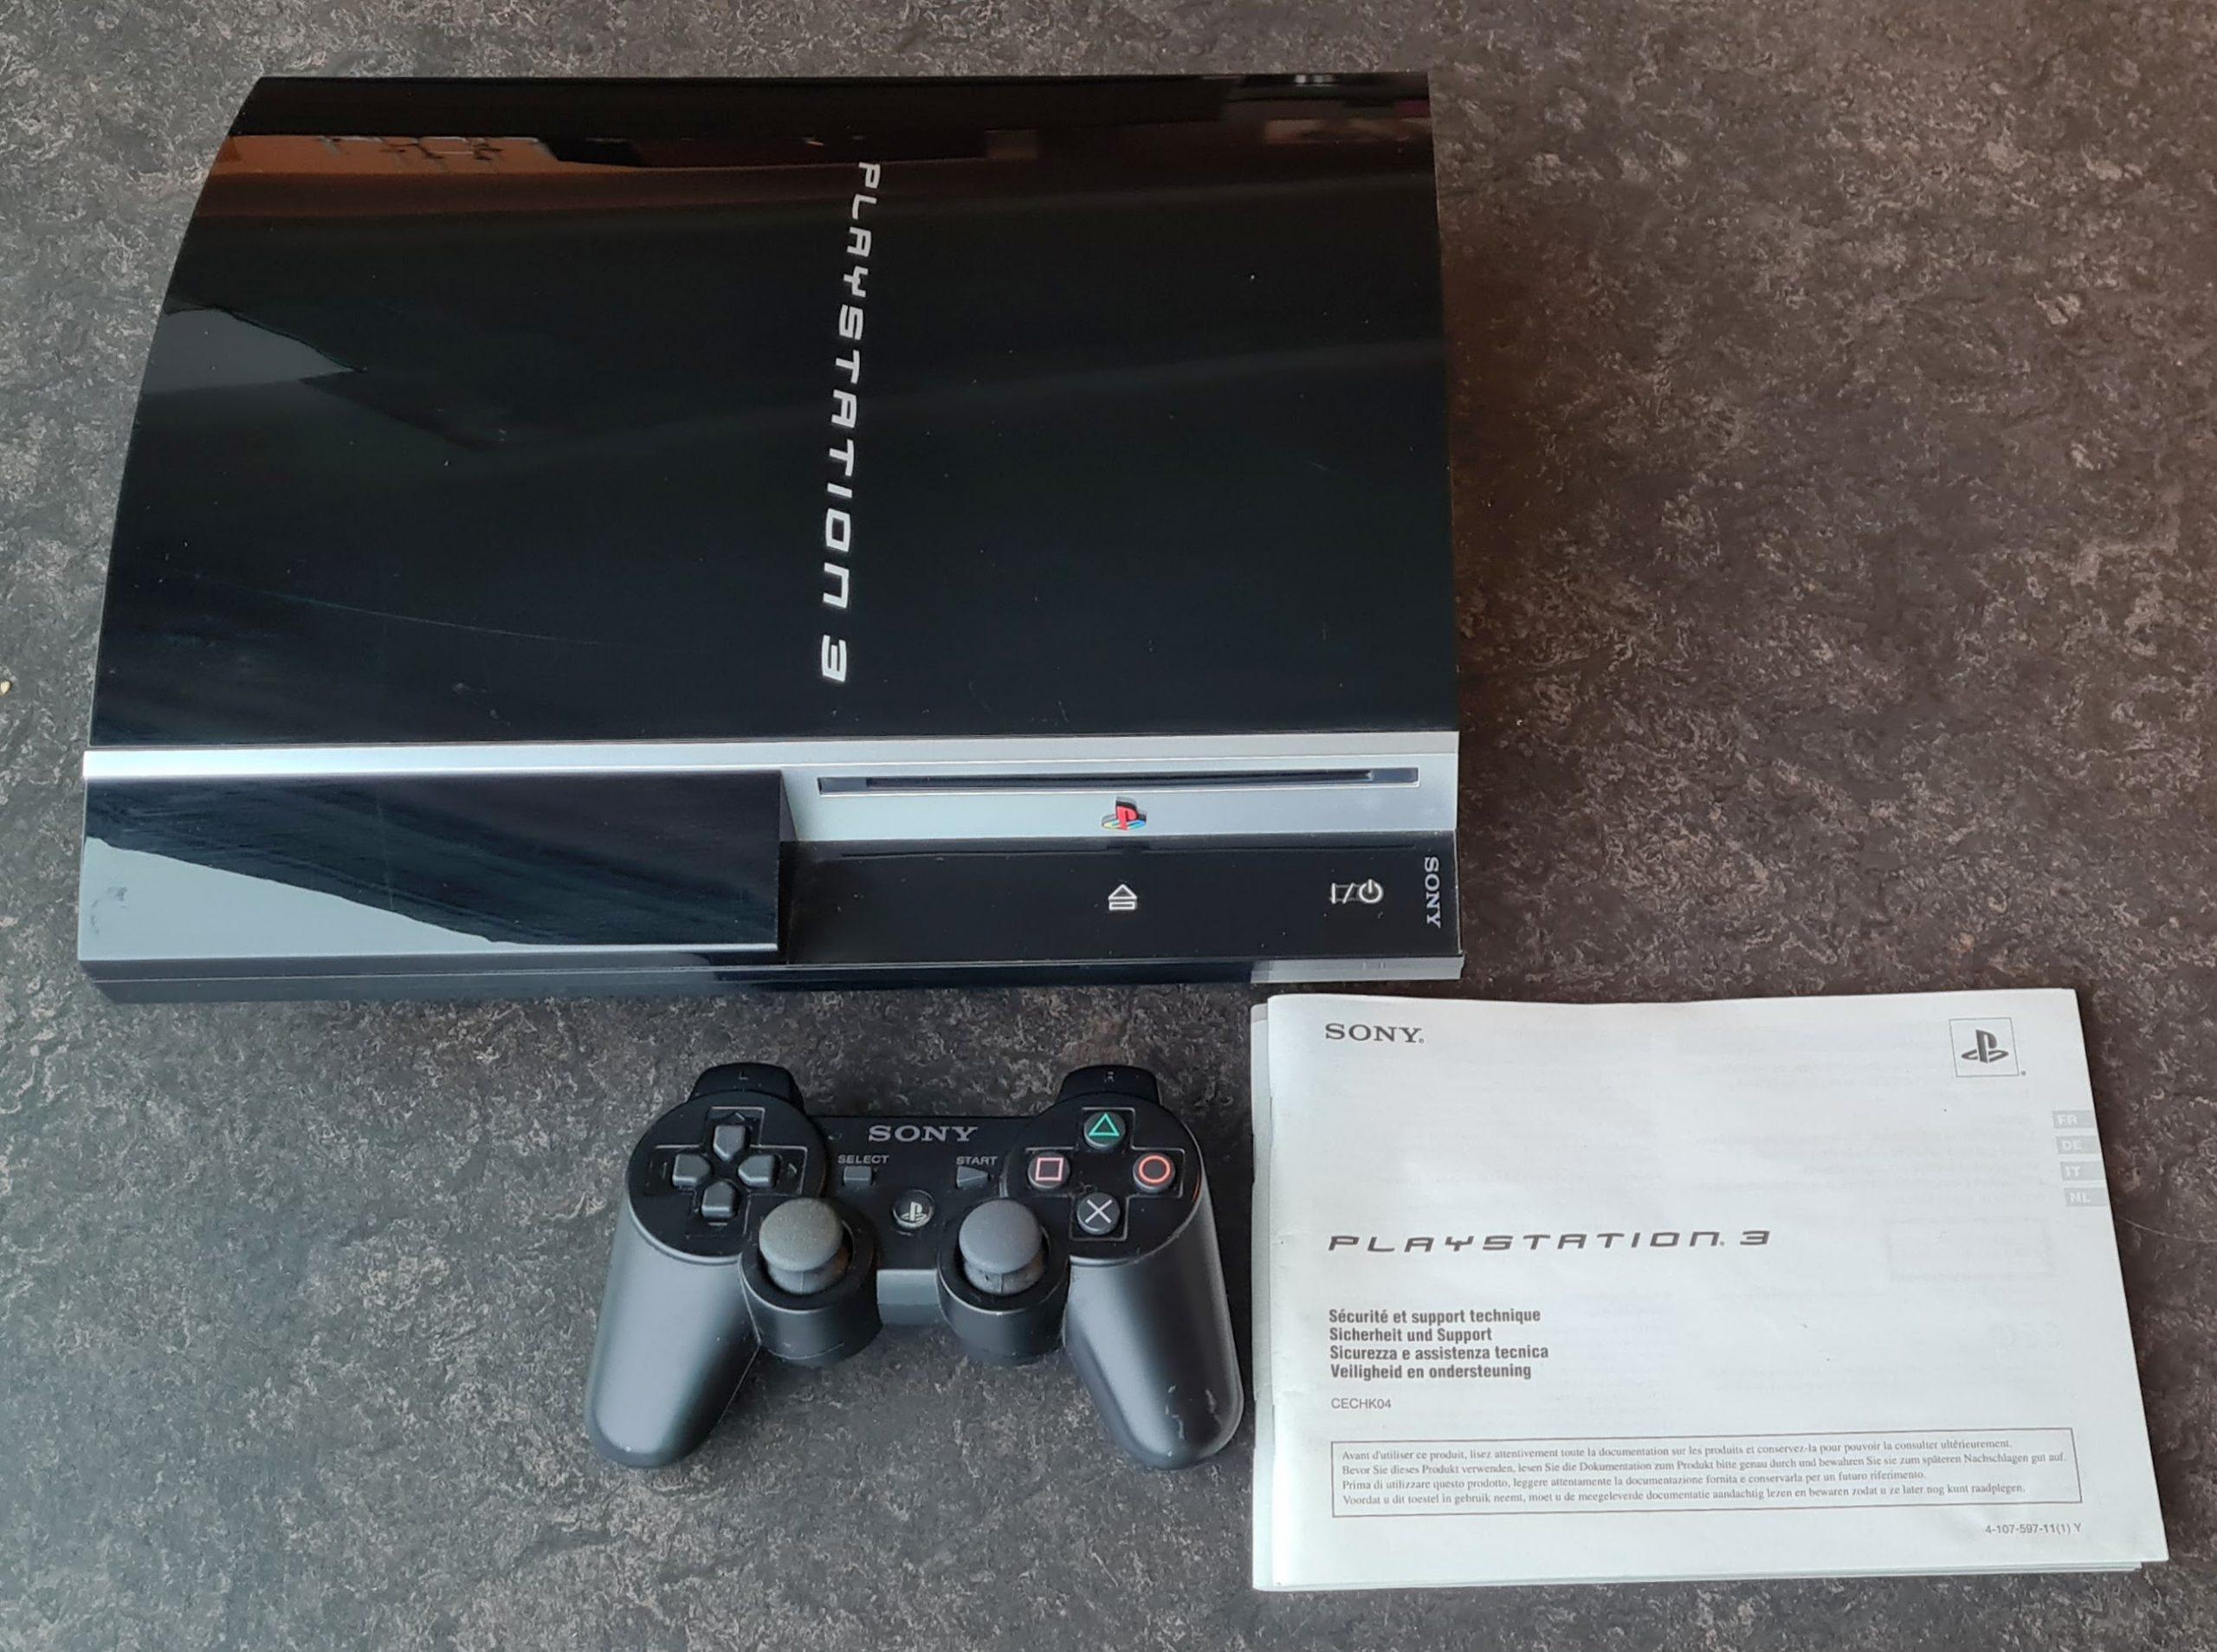 Sony Playstations 3